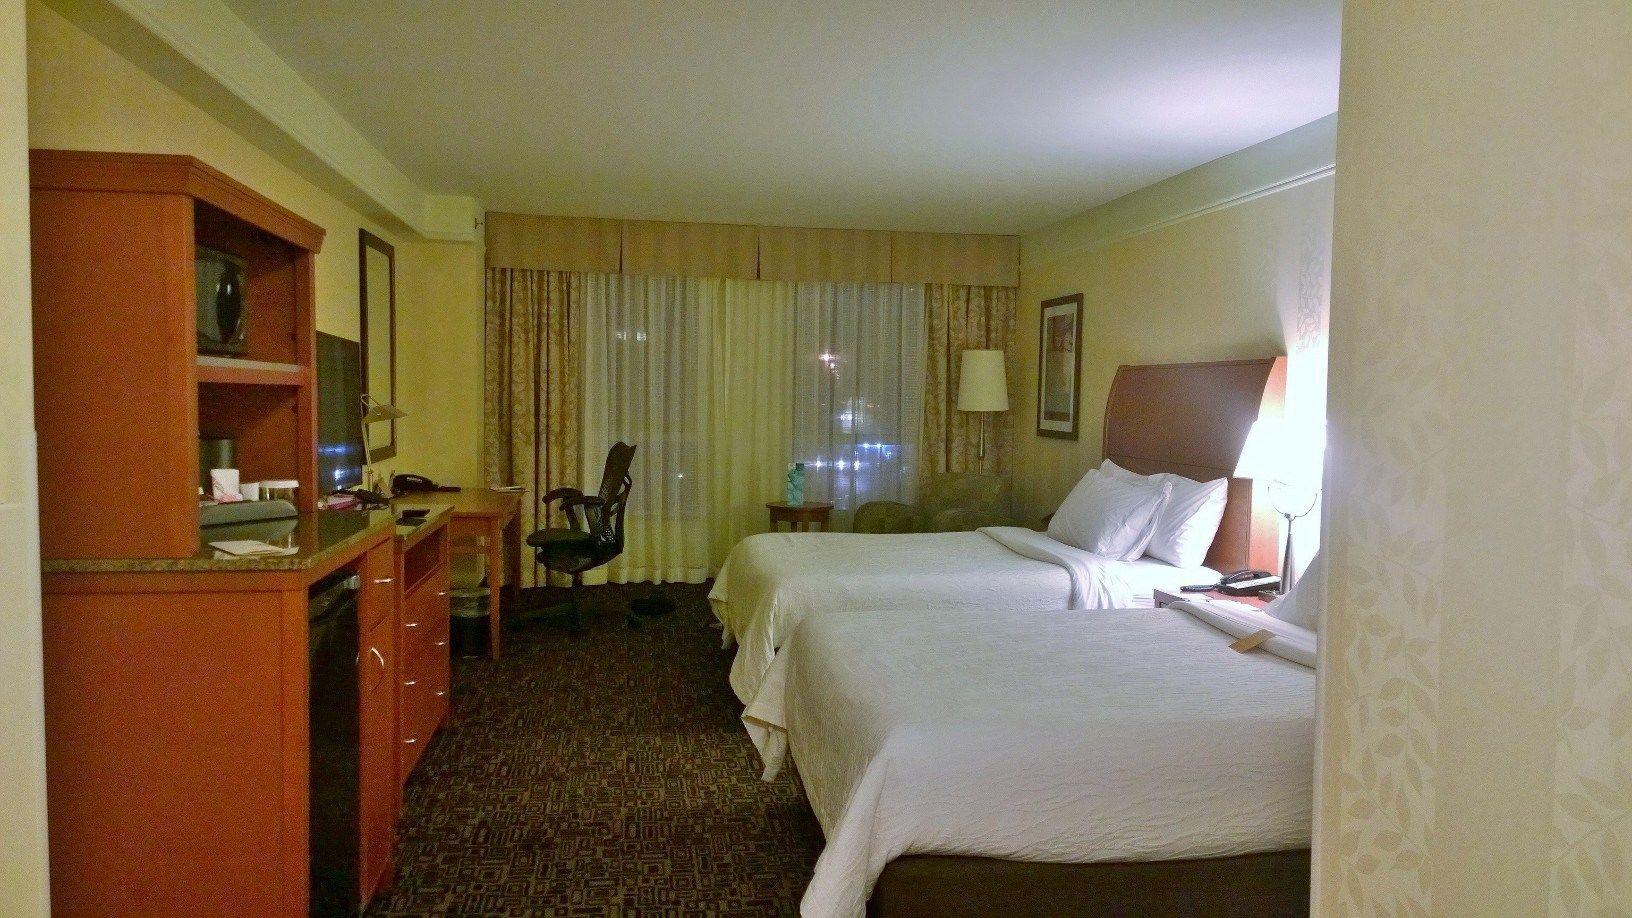 Hotel Review: Hilton Garden Inn Montreal   Travel & Leisure ...